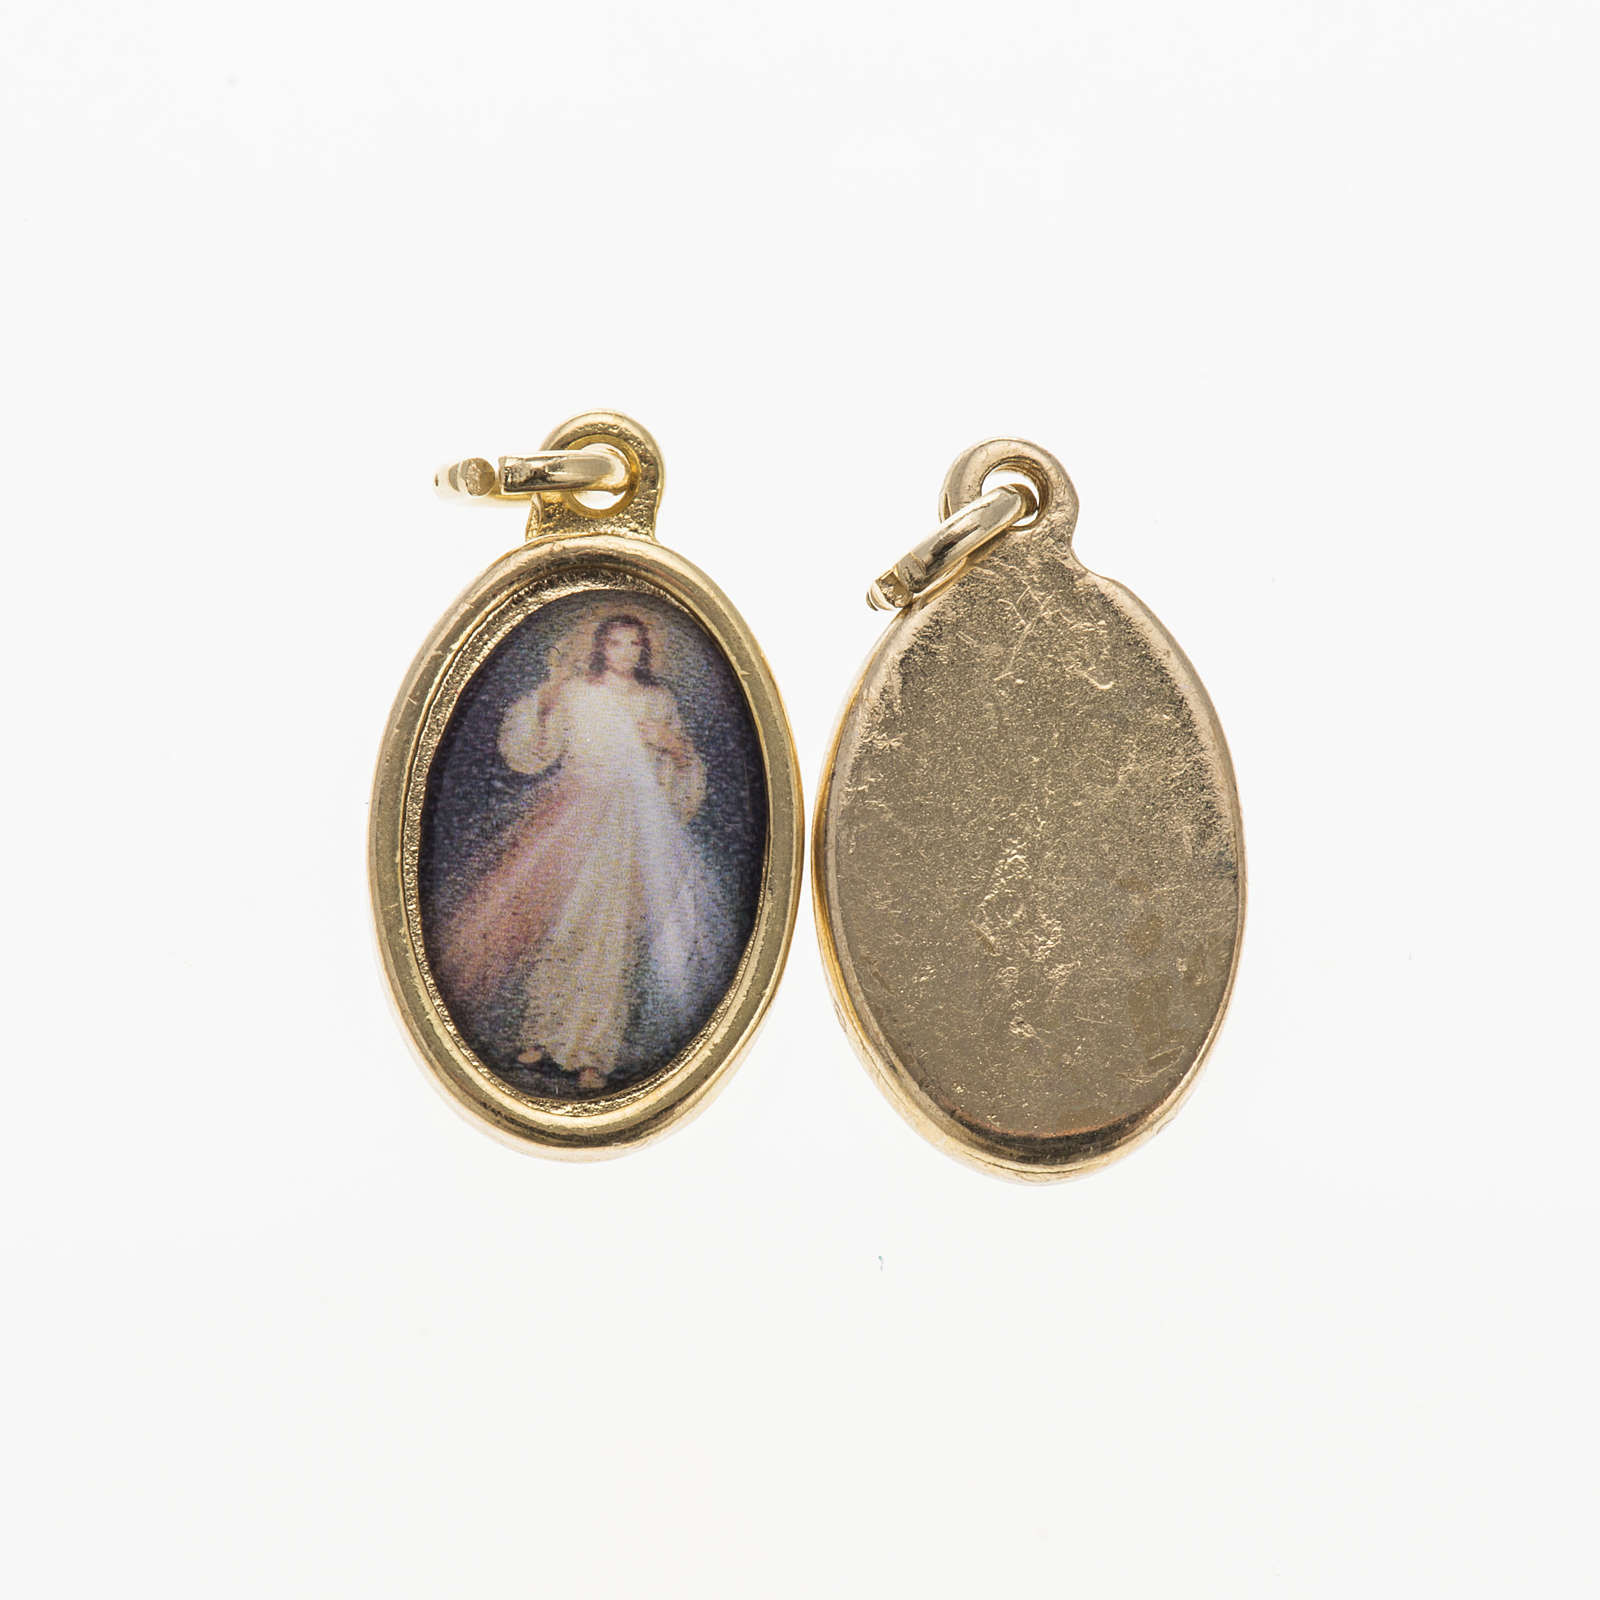 Medalha Cristo Misericordioso metal dourado resina 1,5x1 cm 4